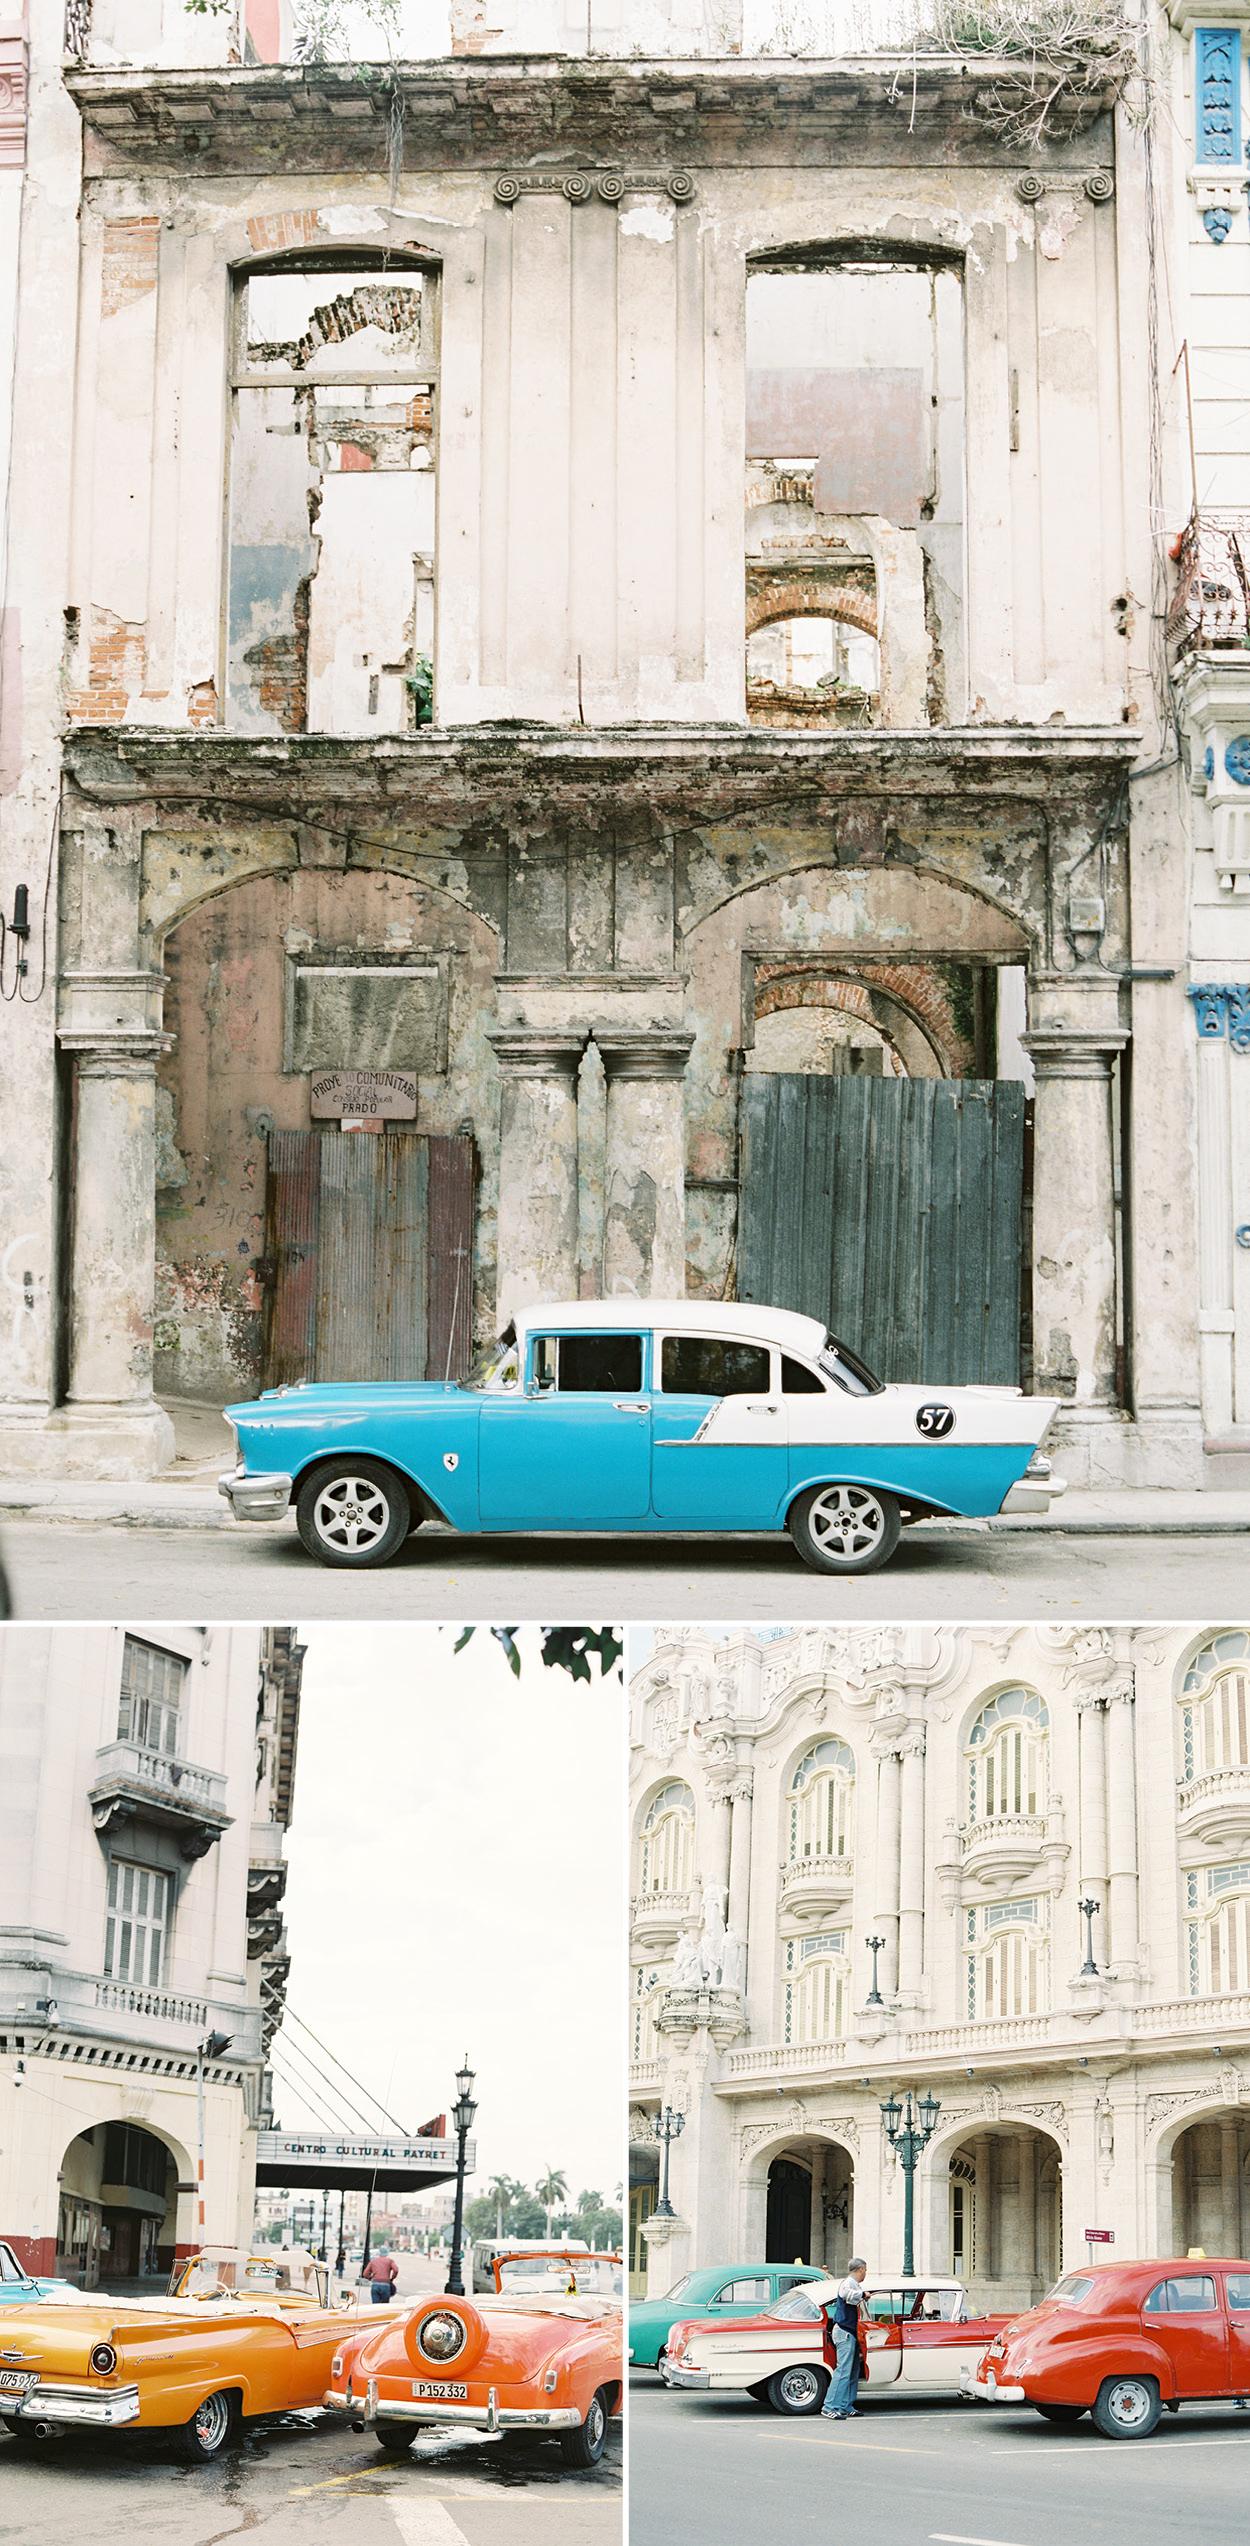 MatthewRee_Cuba_1_010.jpg